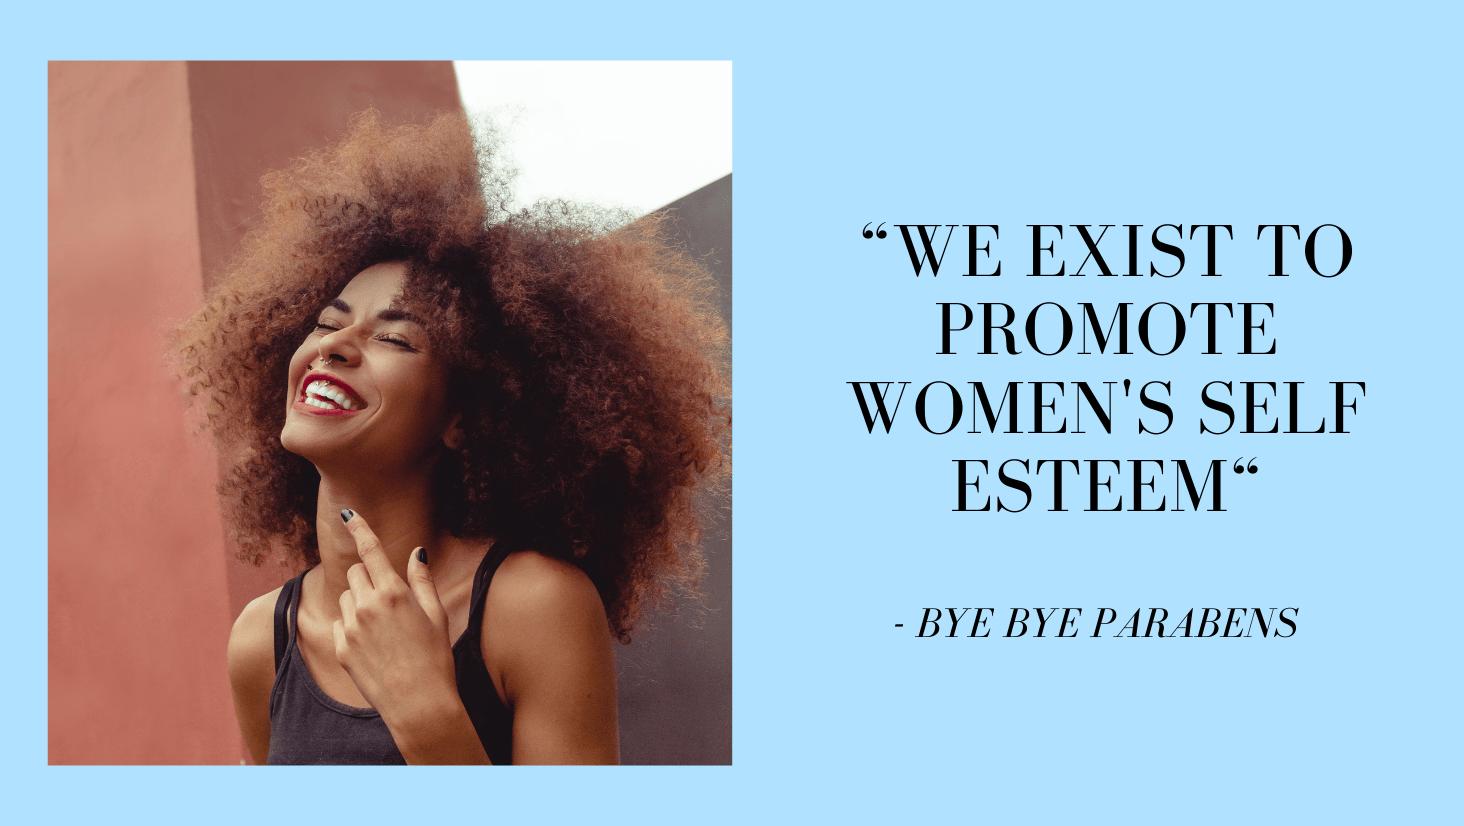 We Exist To Promote Womens Self Esteem - Bye Bye Parabens